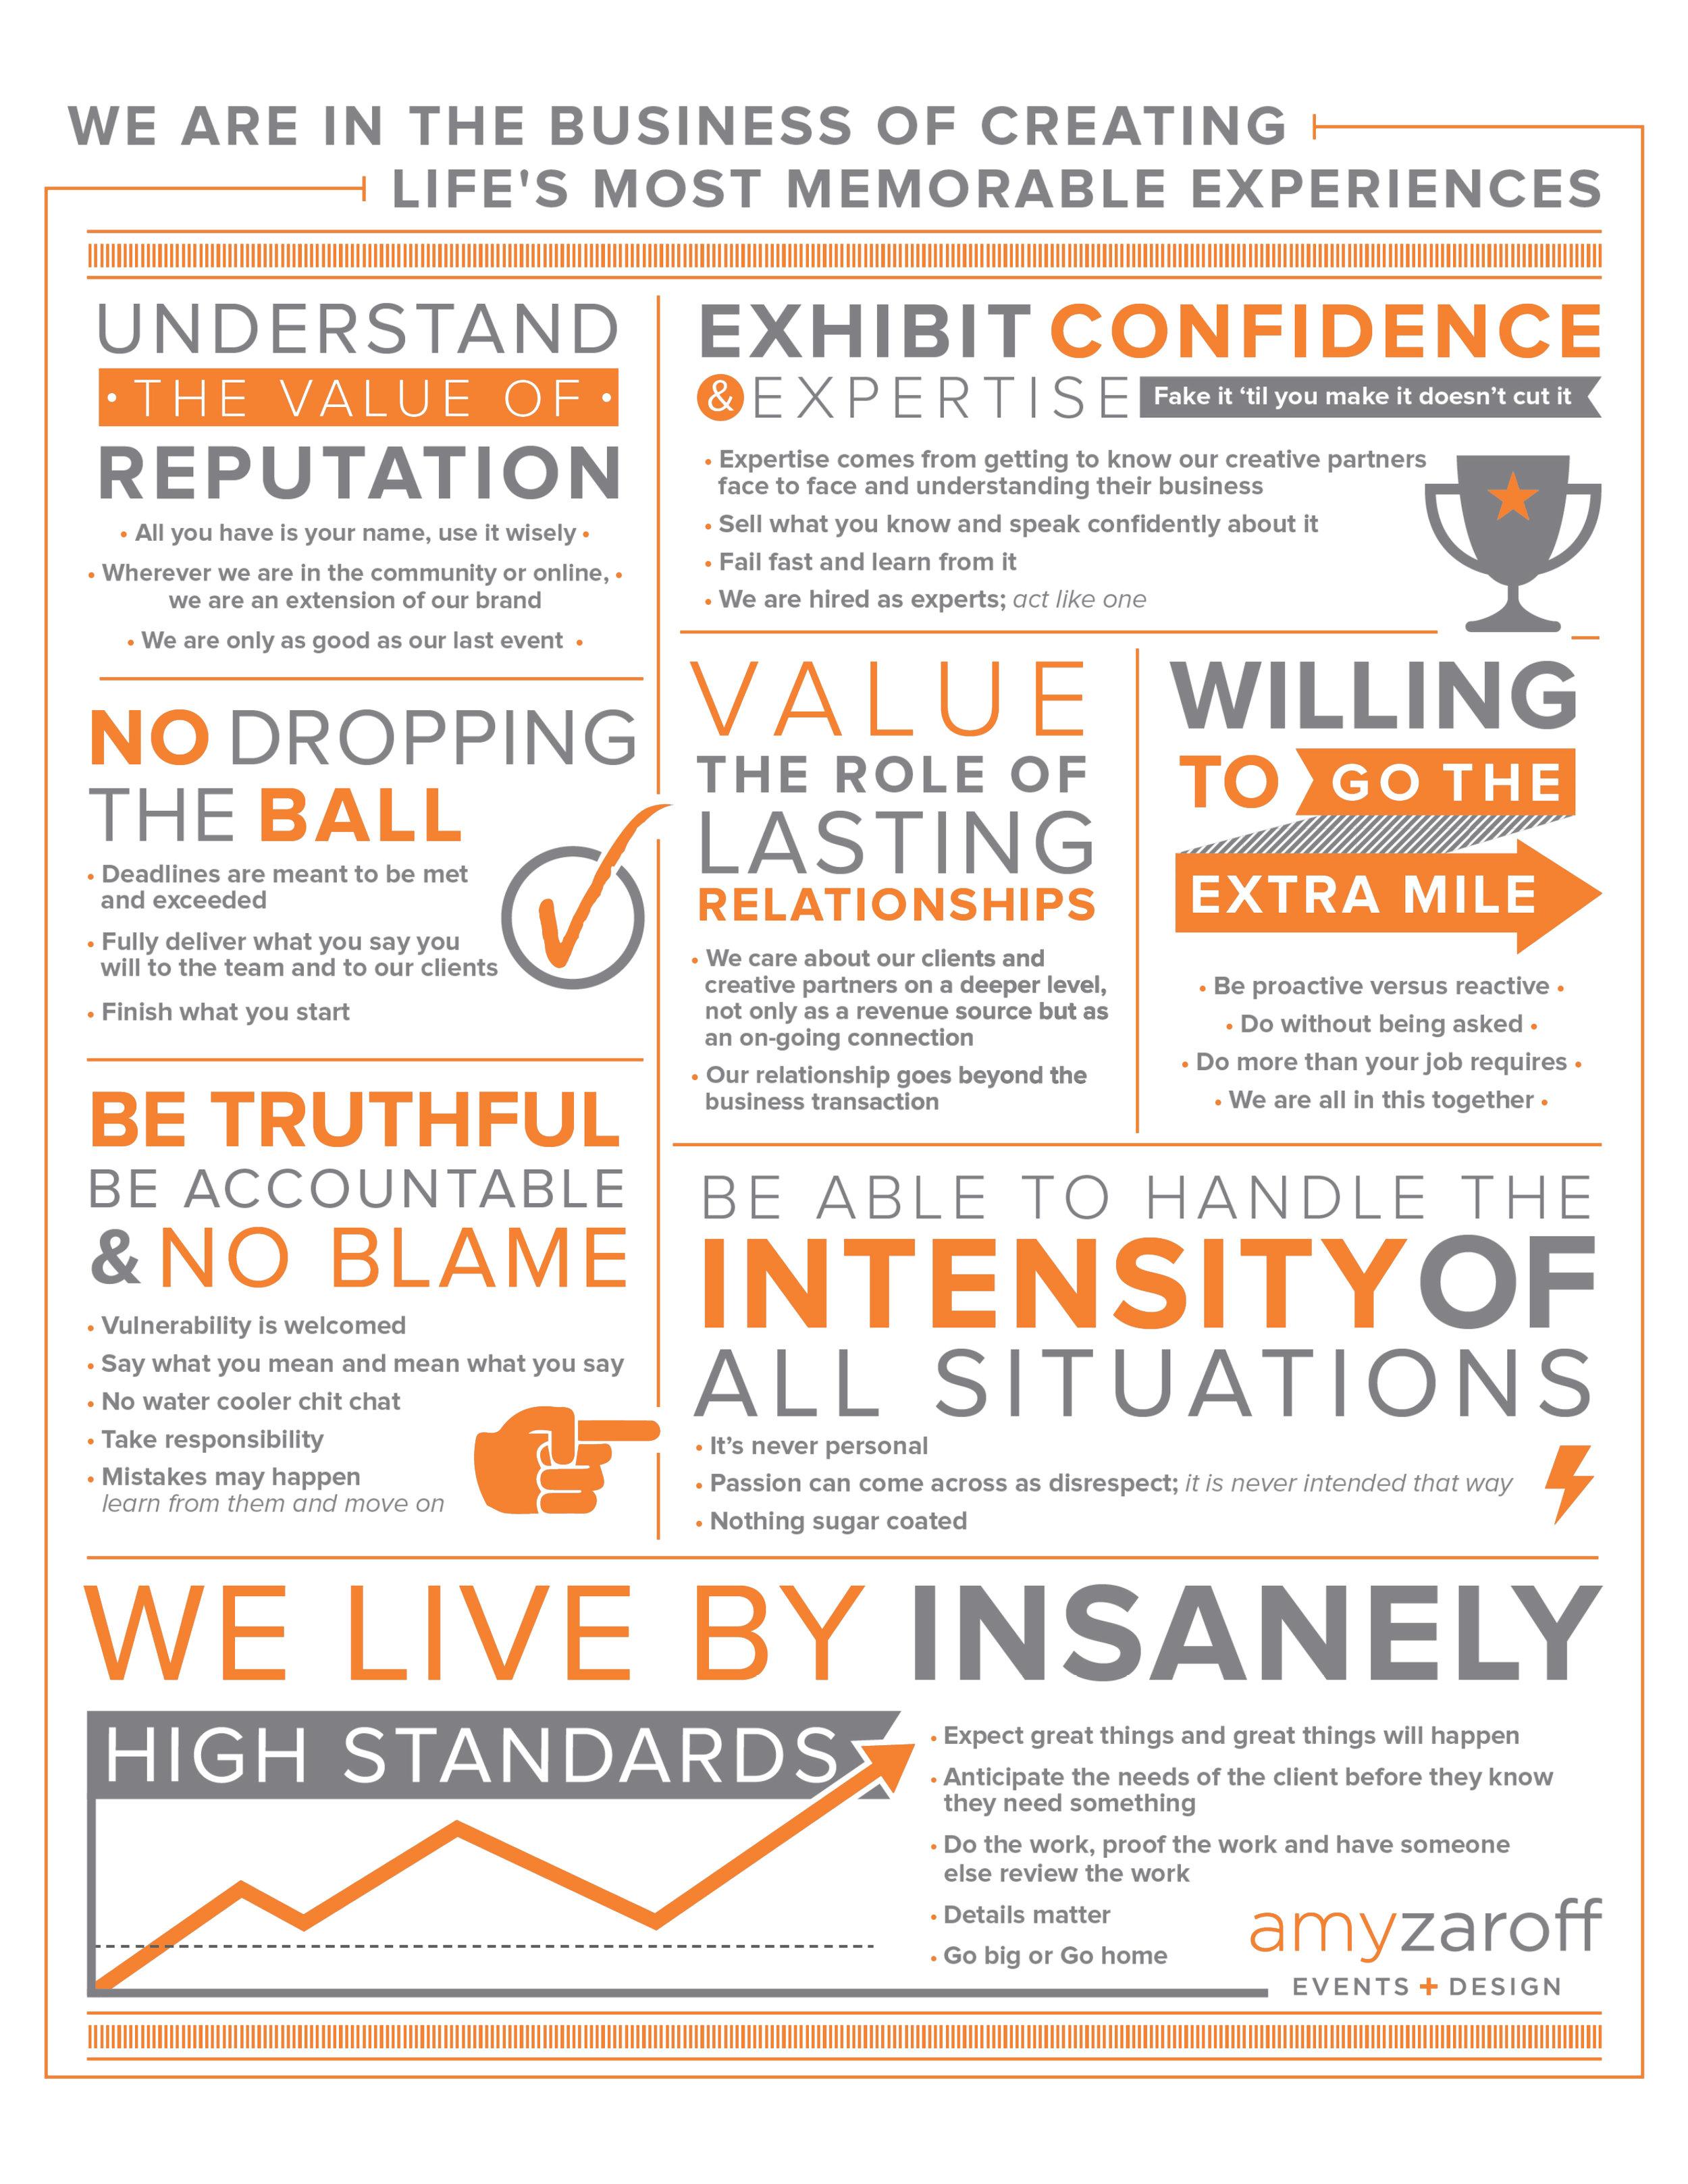 Amy Zaroff - Core Values